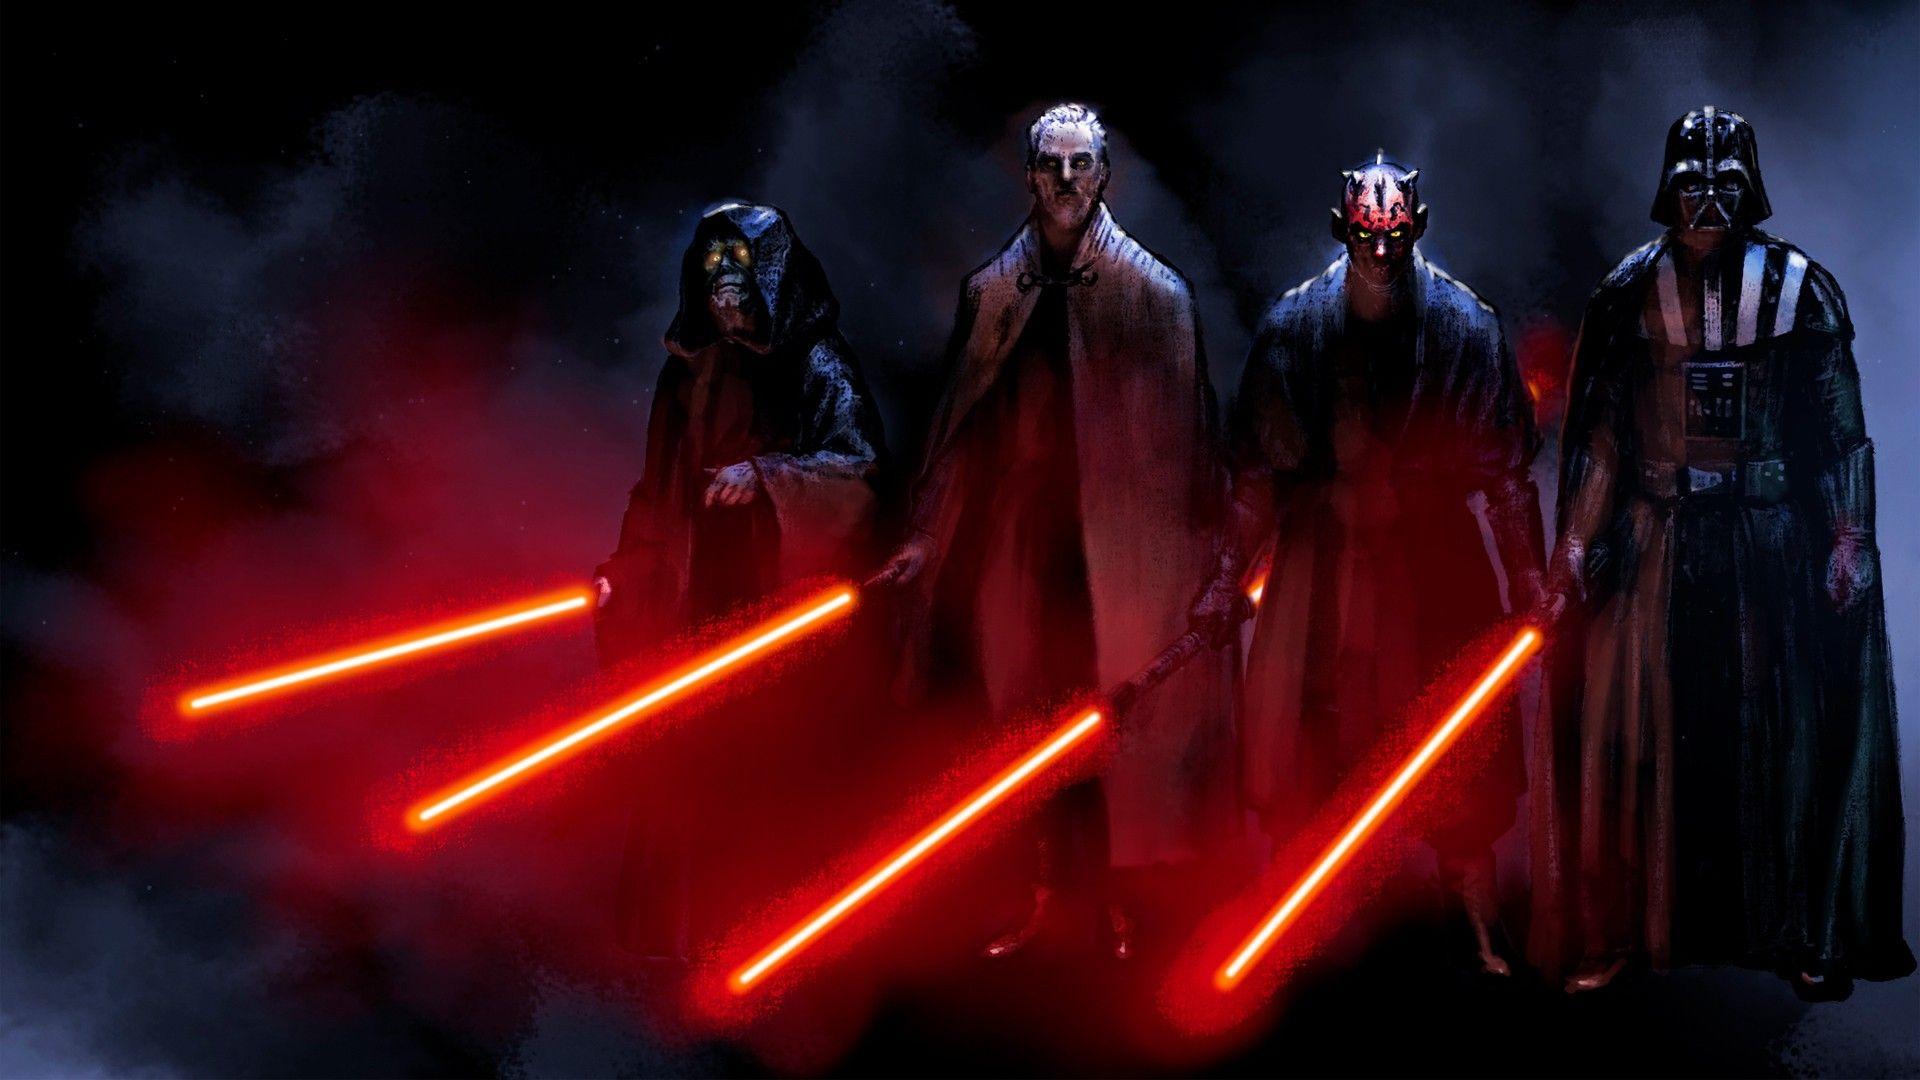 Free Download Star Wars Lightsabers Hd Wallpaper Fullhdwpp Full Hd